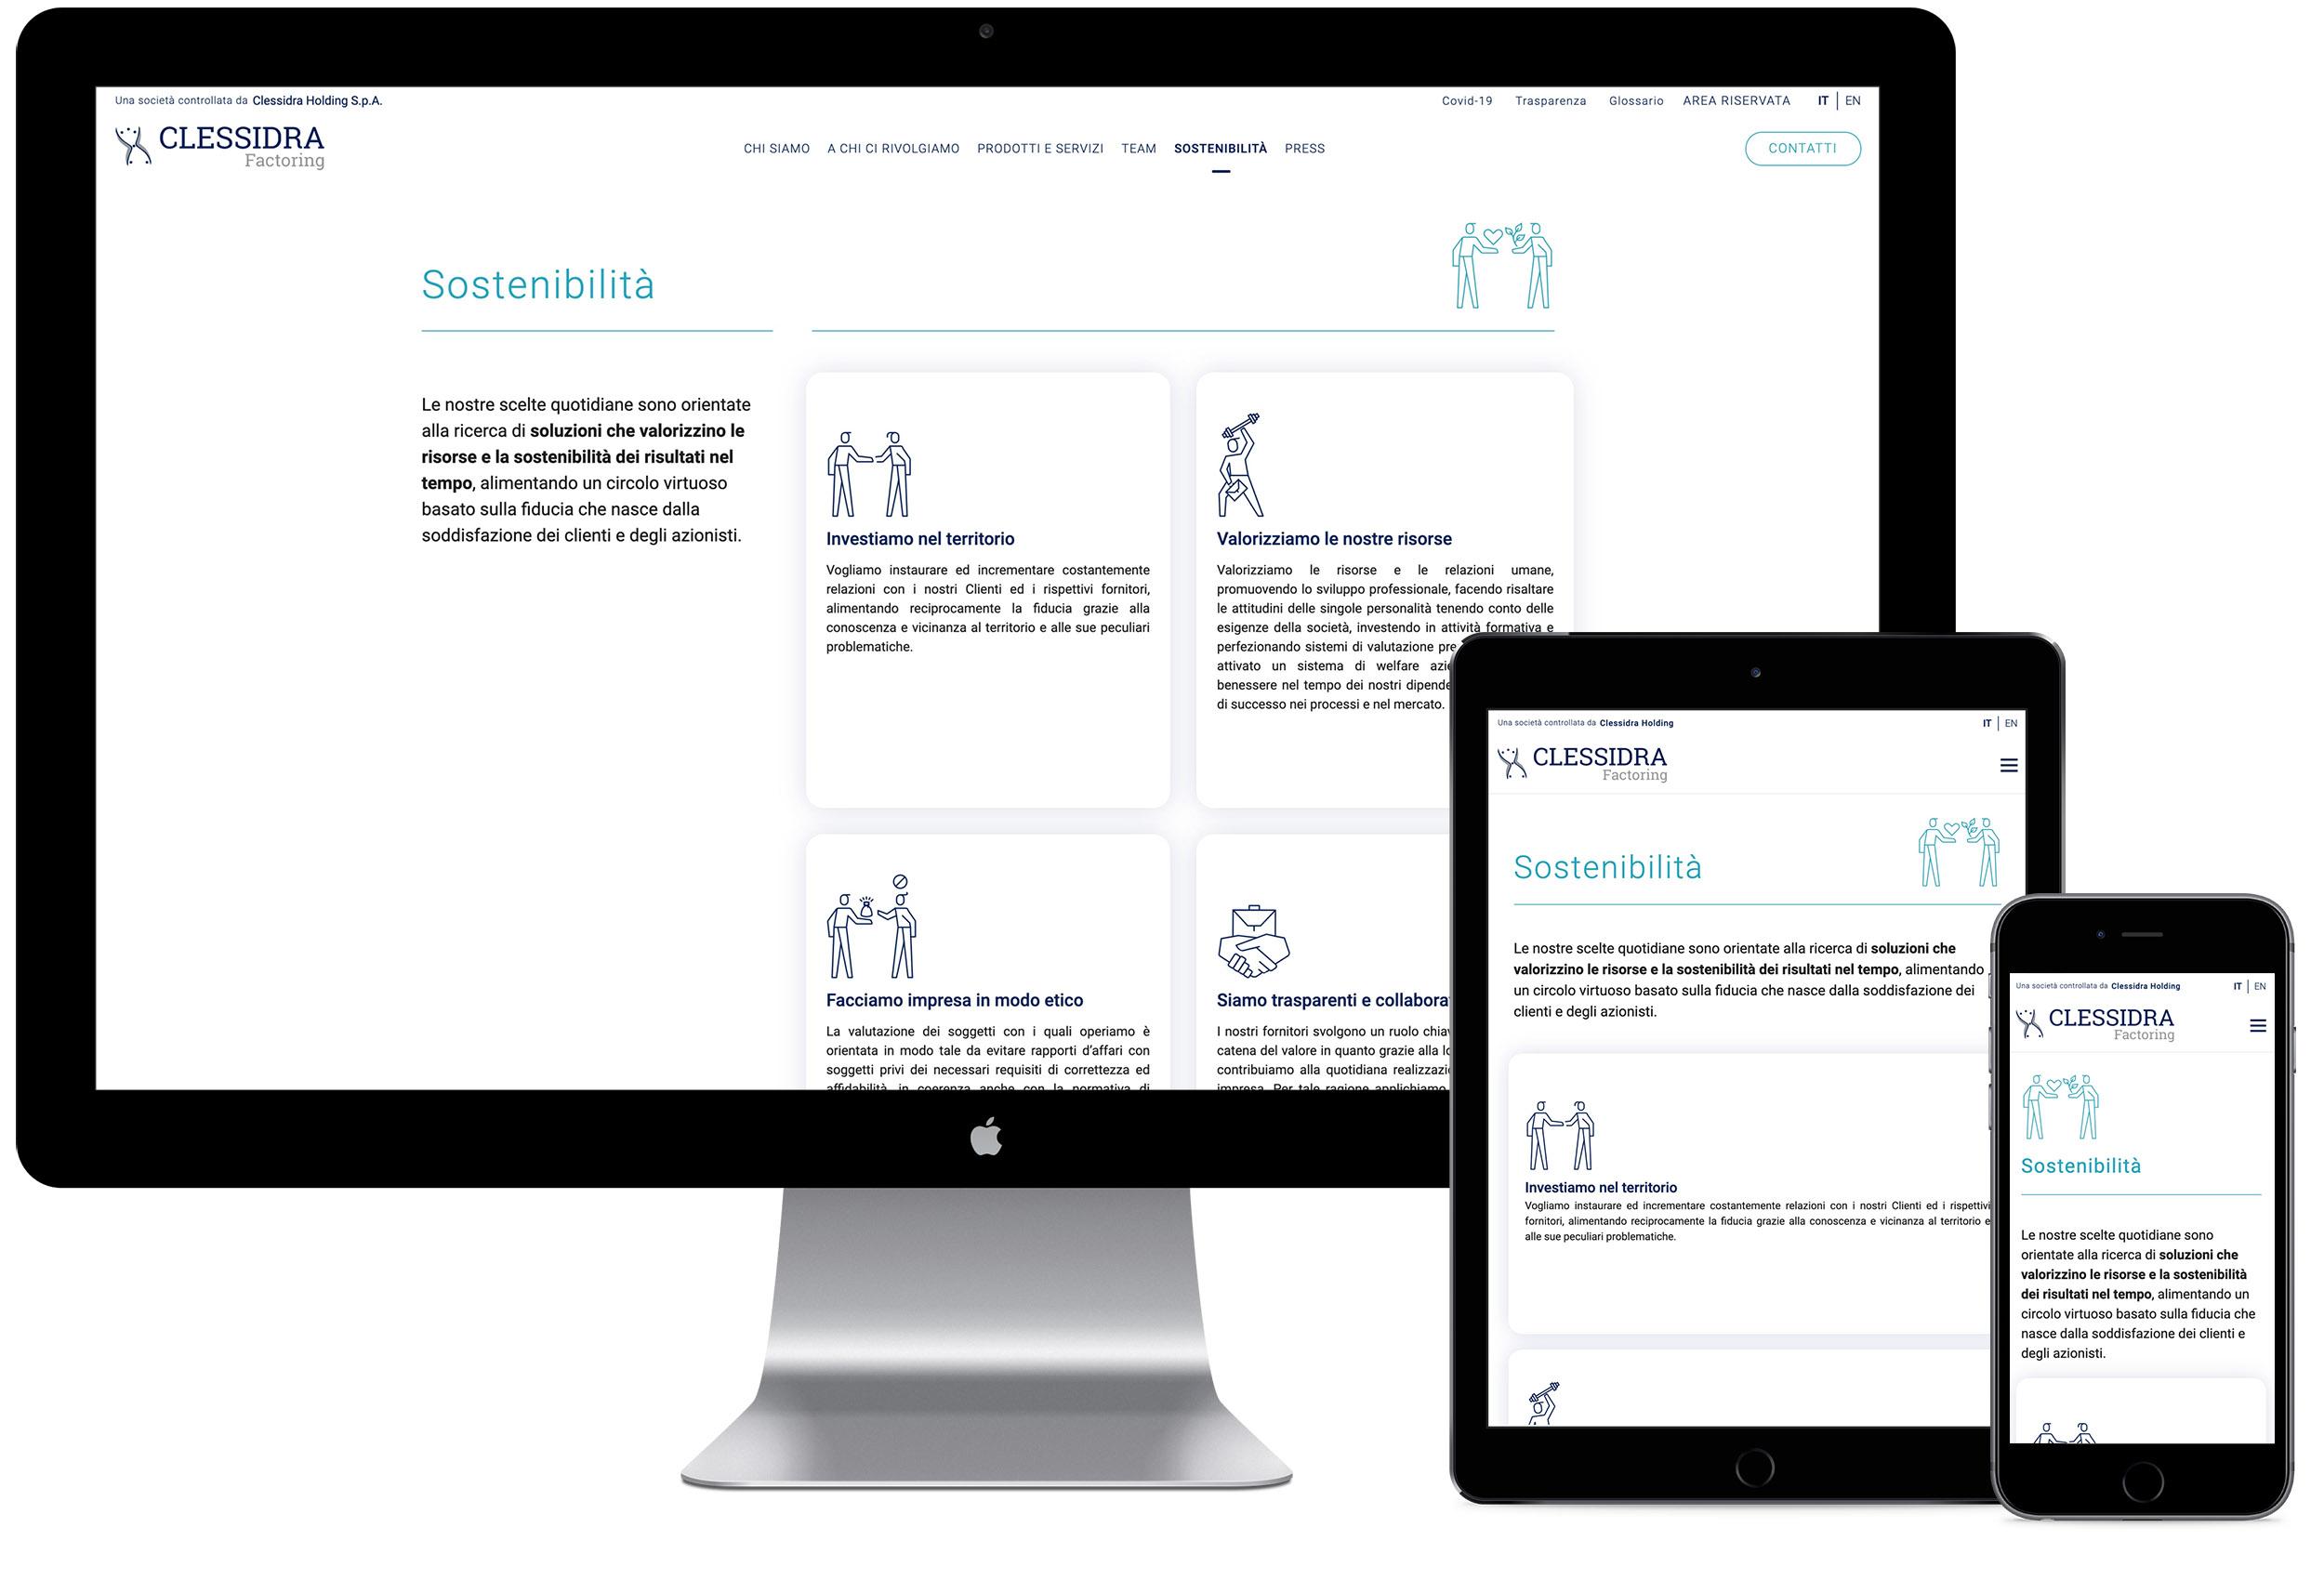 KFDS - Case Study - Clessidra Website Responsive